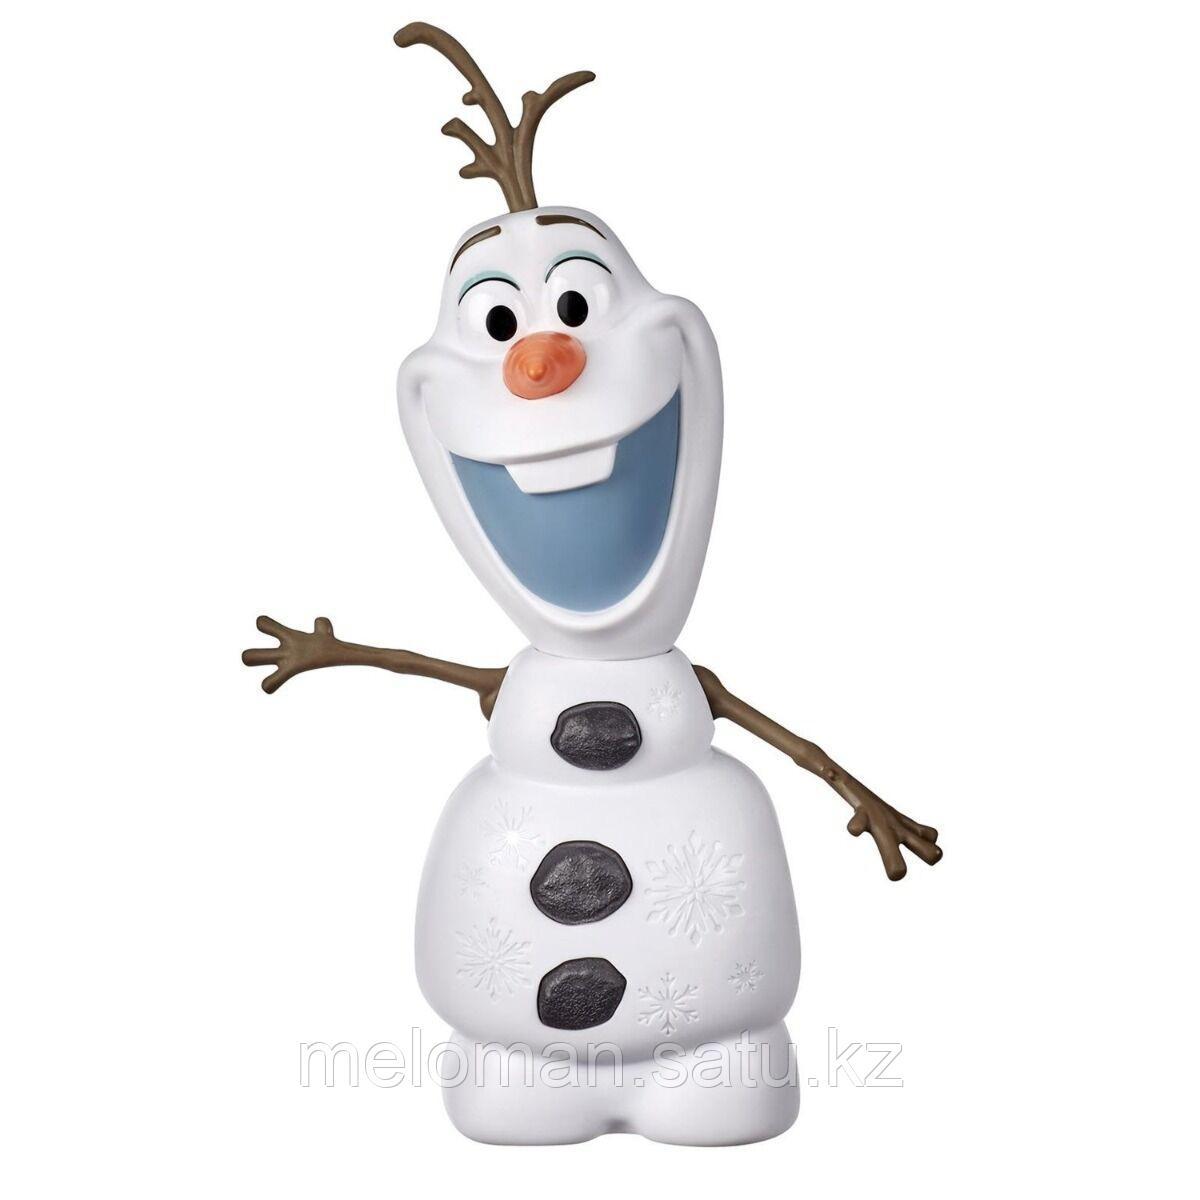 Disney Frozen: ИГРУШКА ХОЛОД СЕРД2 ИНТЕРАКТИВНЫЙ ОЛАФ - фото 1